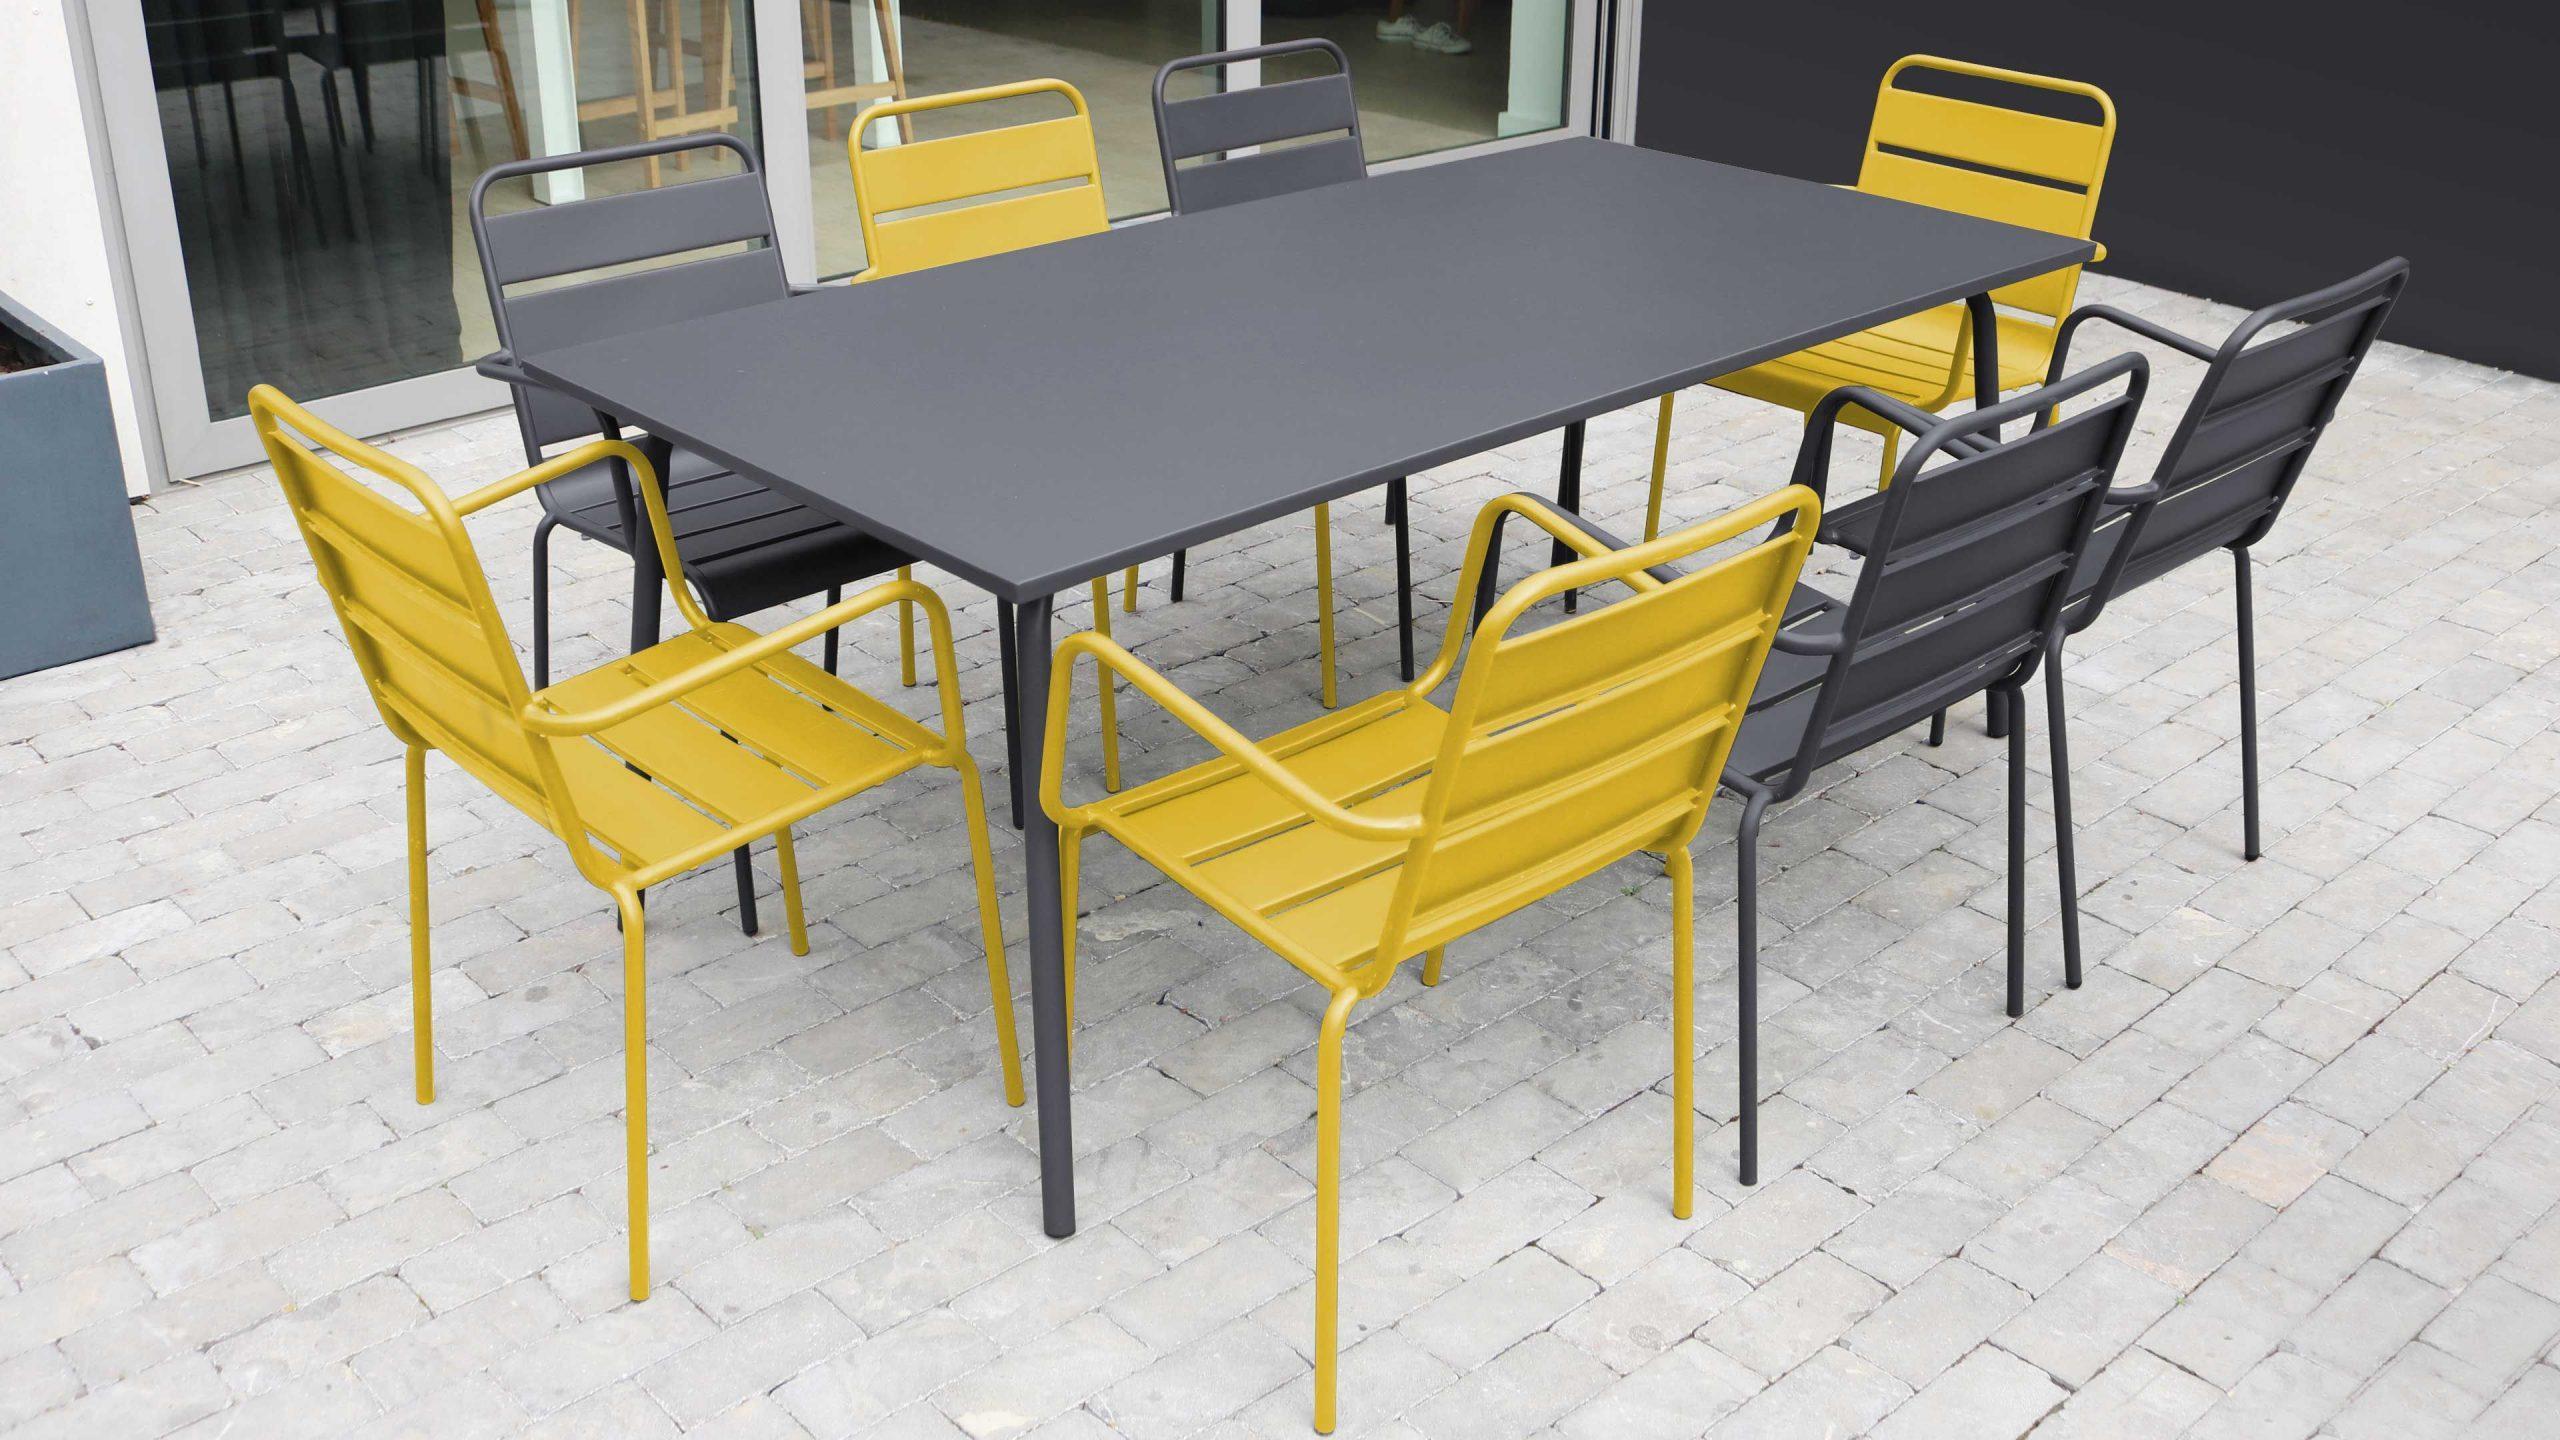 Salon De Jardin Metal Table Et Fauteuils concernant Salon De Jardin Table Haute